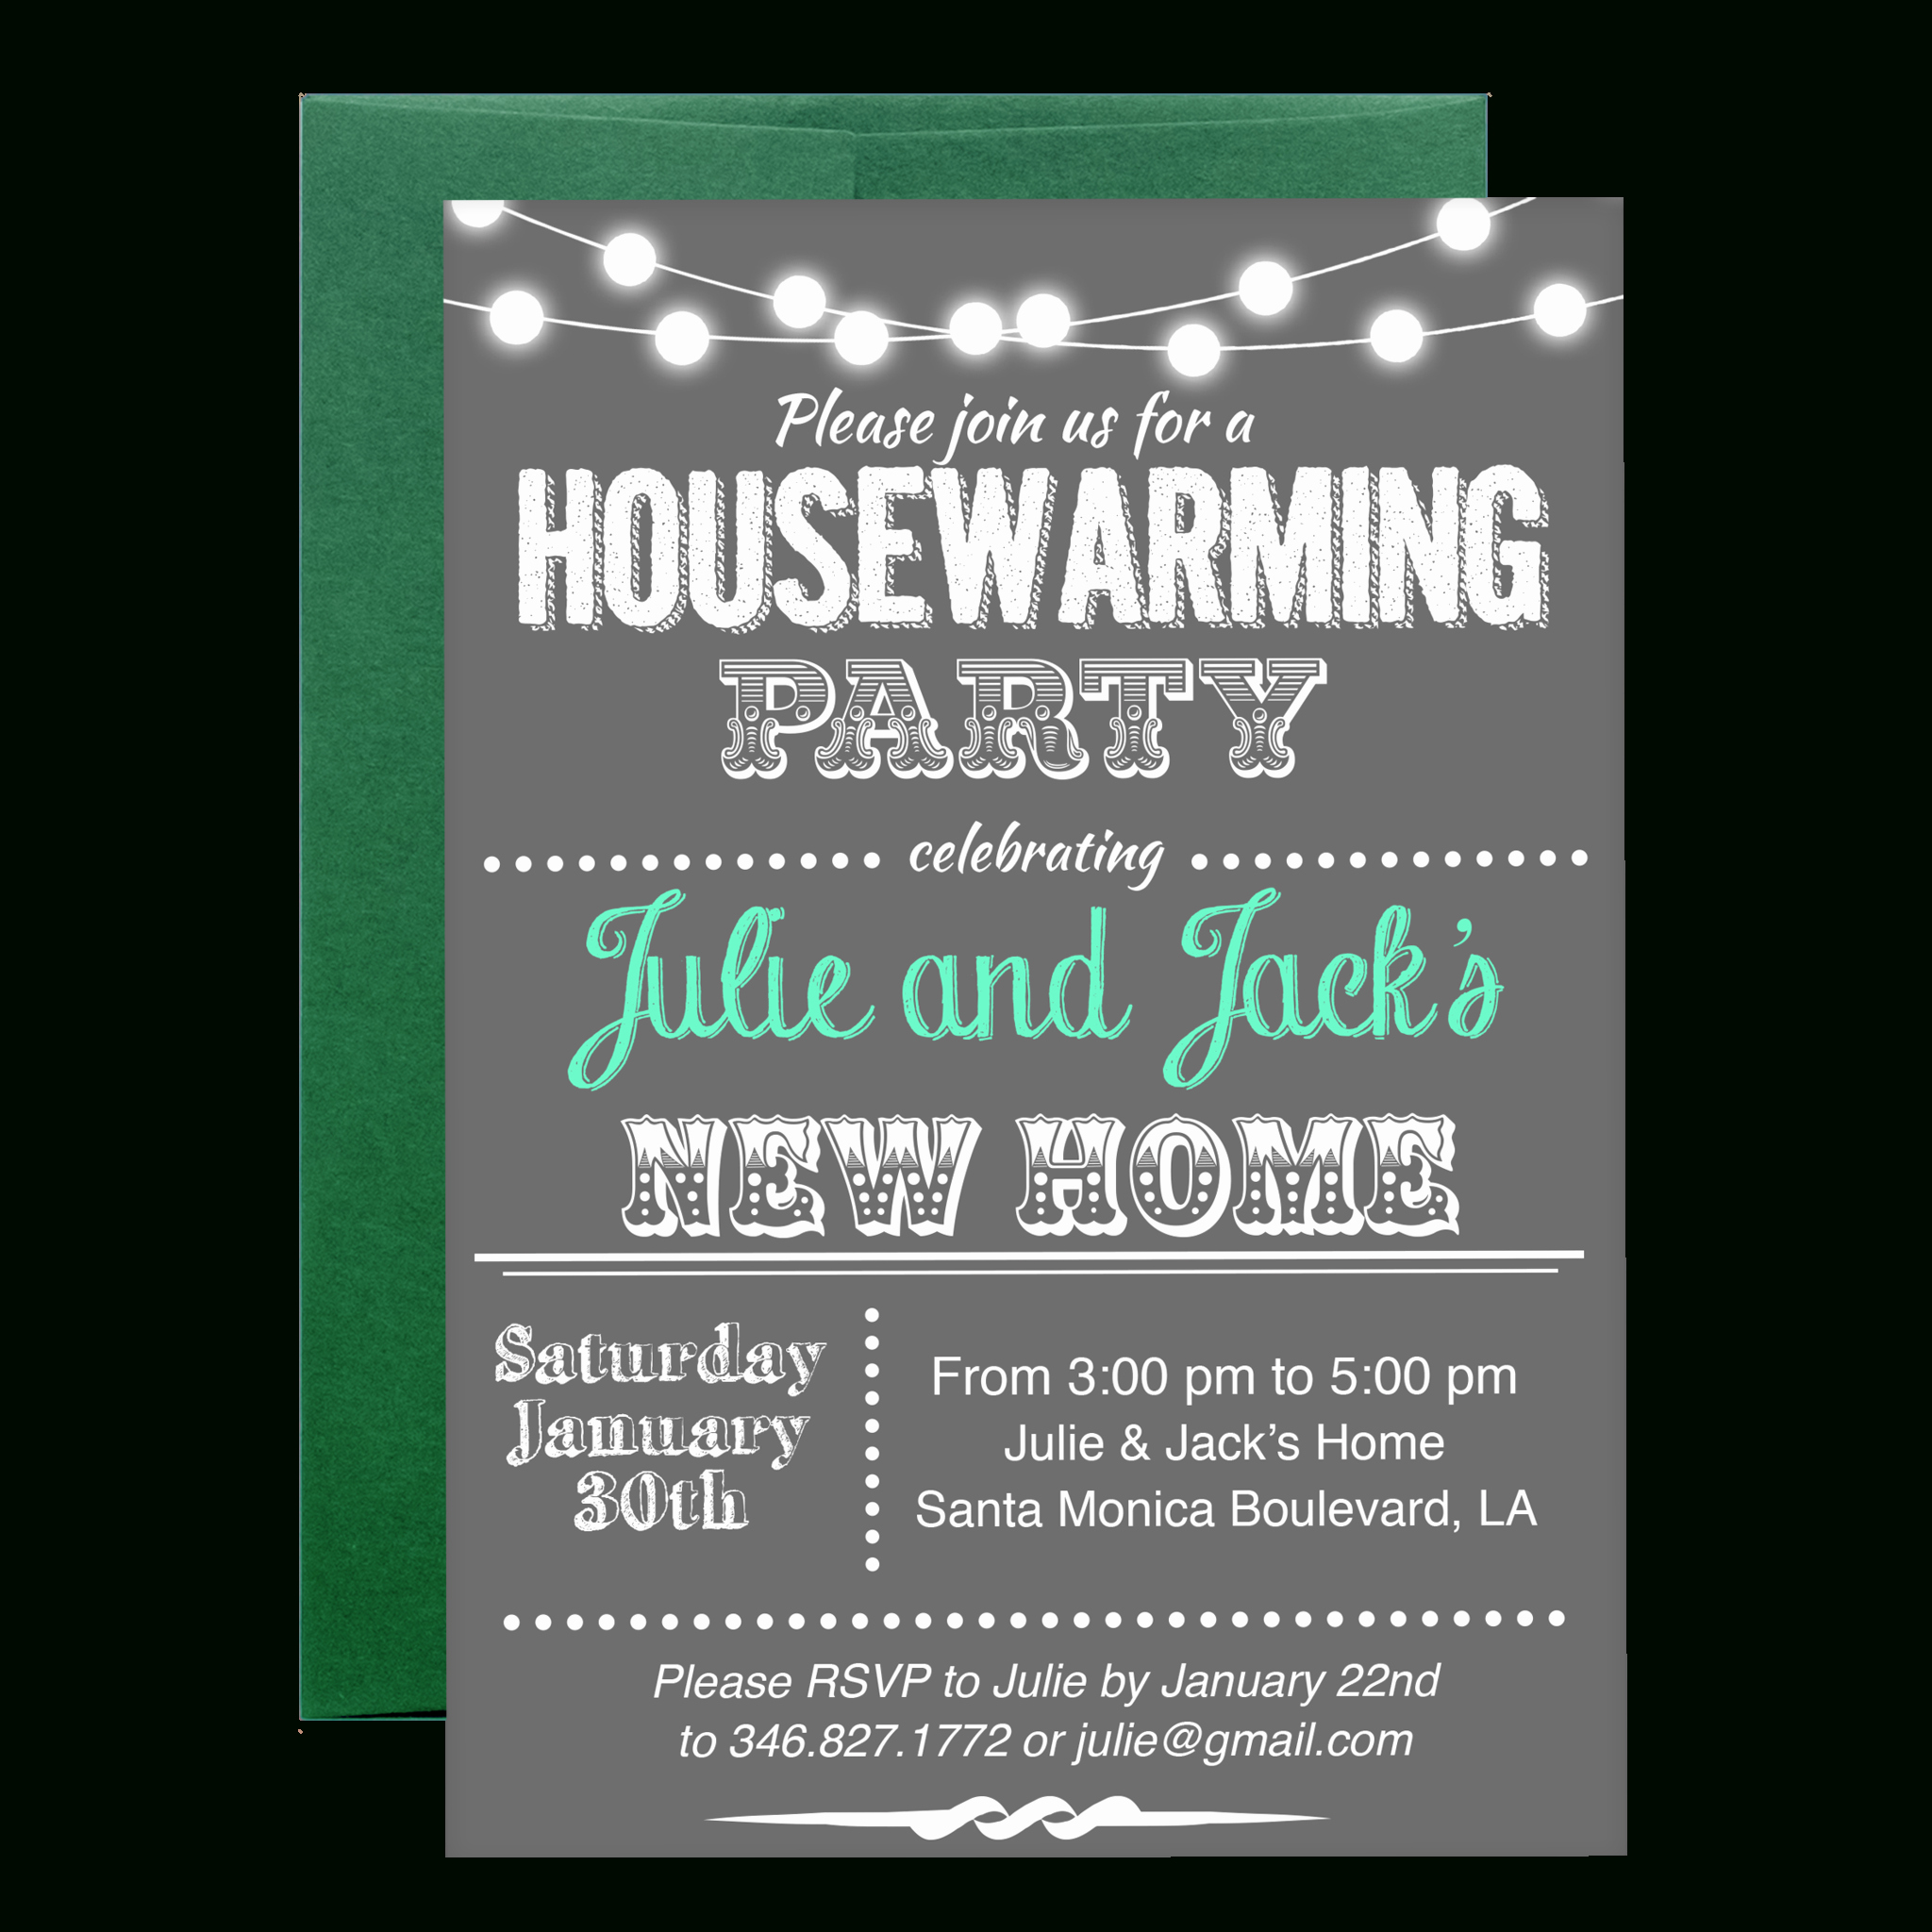 Housewarming Party Invitation Template Xors3d Template 2018